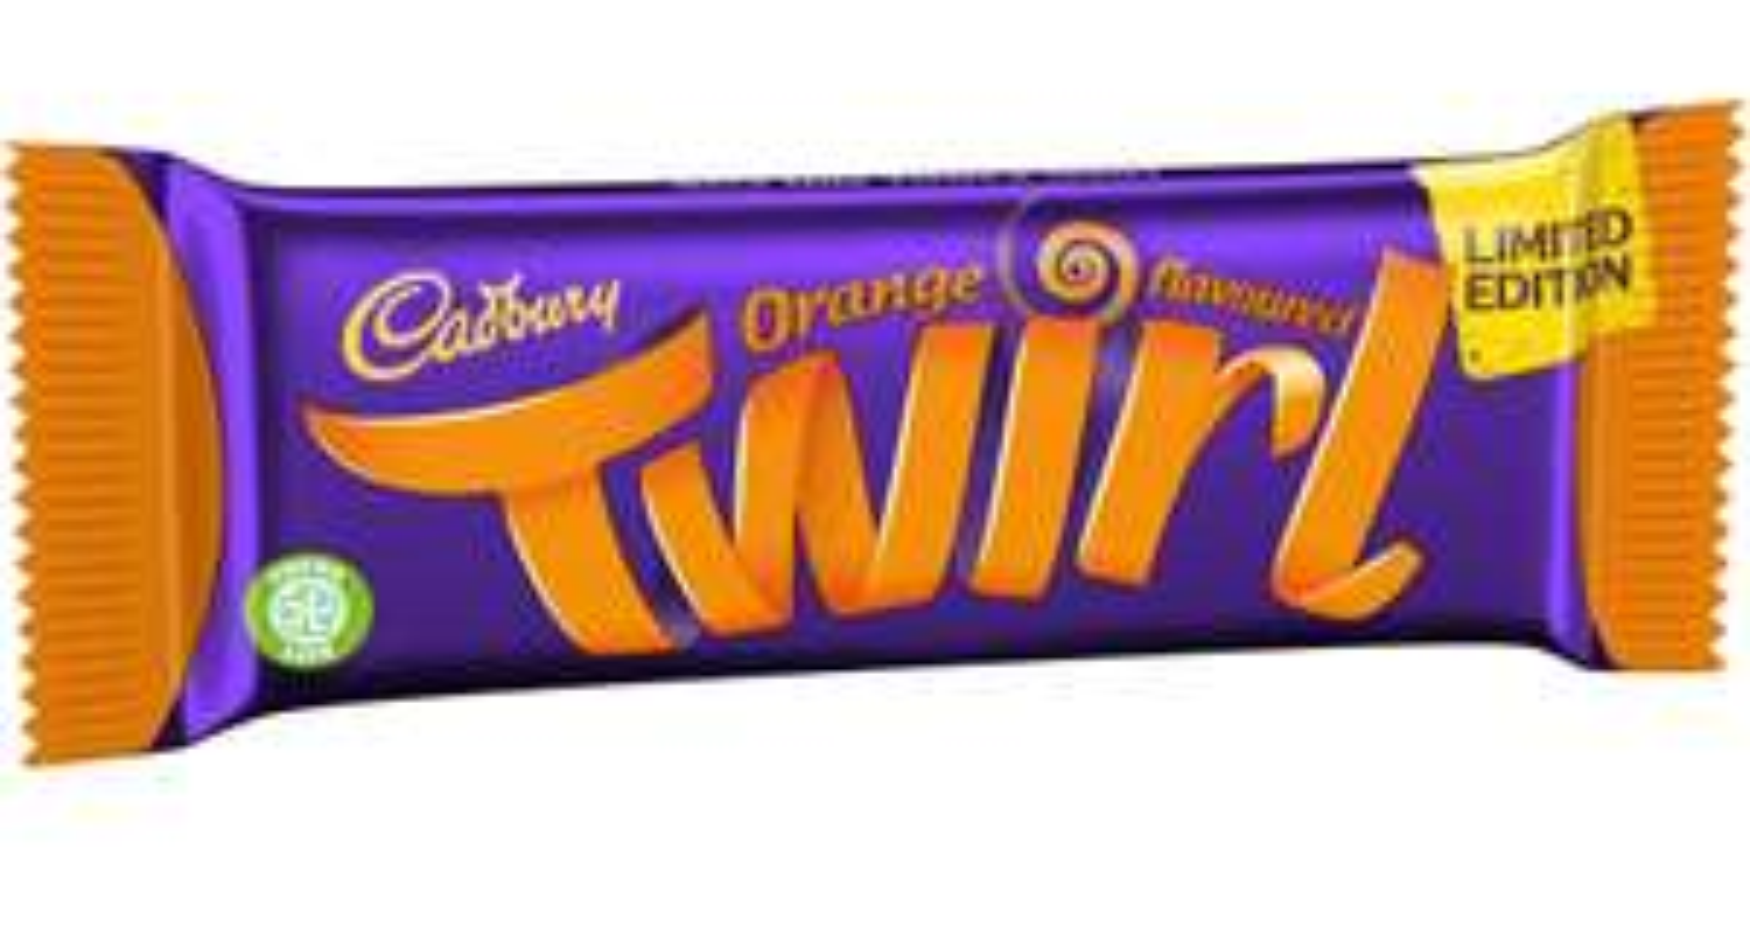 Limited Edition Cadbury Twirl orange 49p in store at B&M